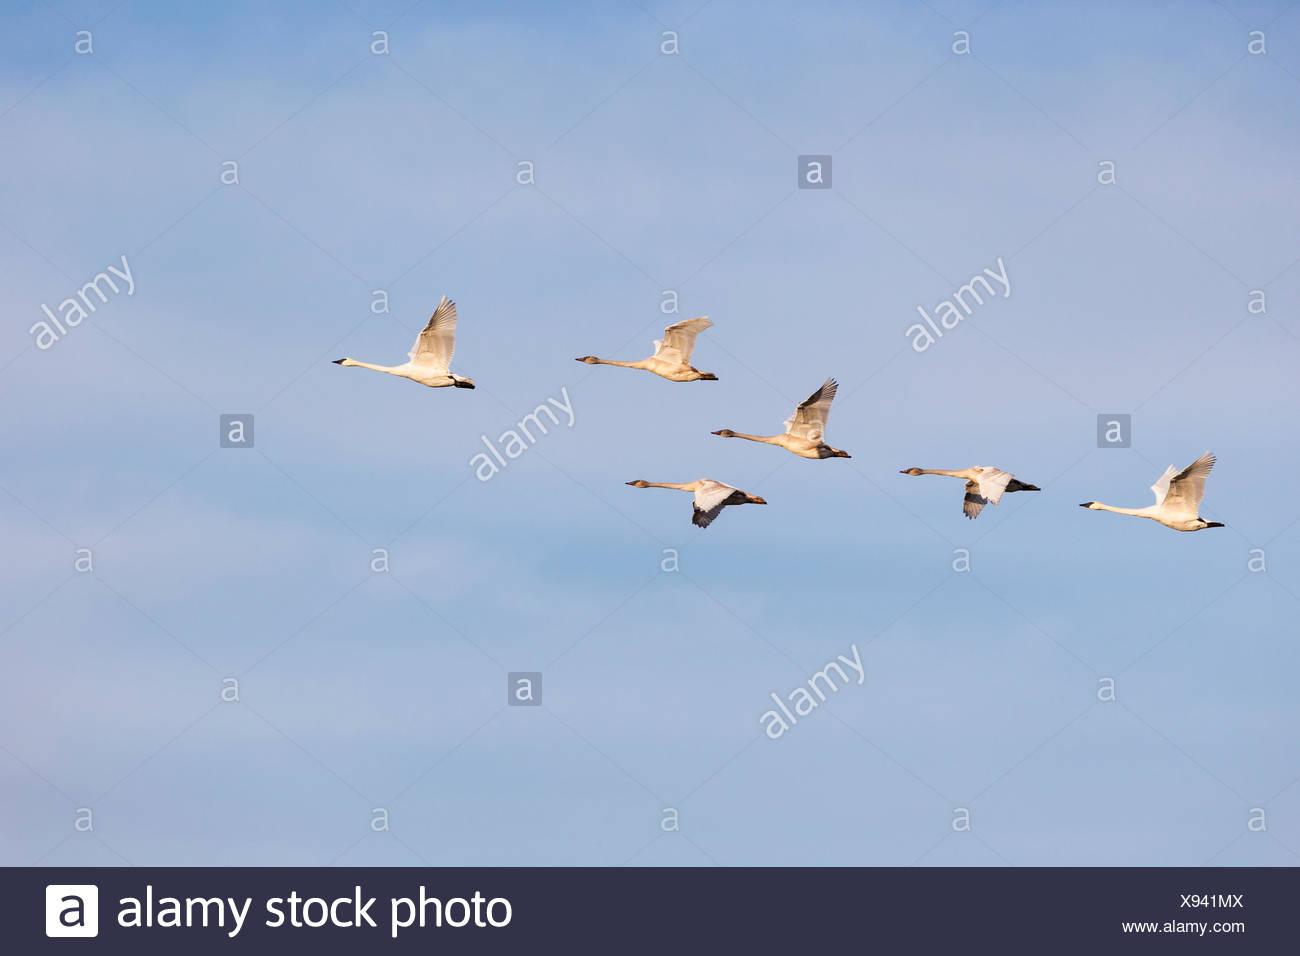 Trumpeter swan), (Cygnus buccinator), adults and juveniles, Nanaimo River Estuary, Nanaimo, British Columbia. - Stock Image